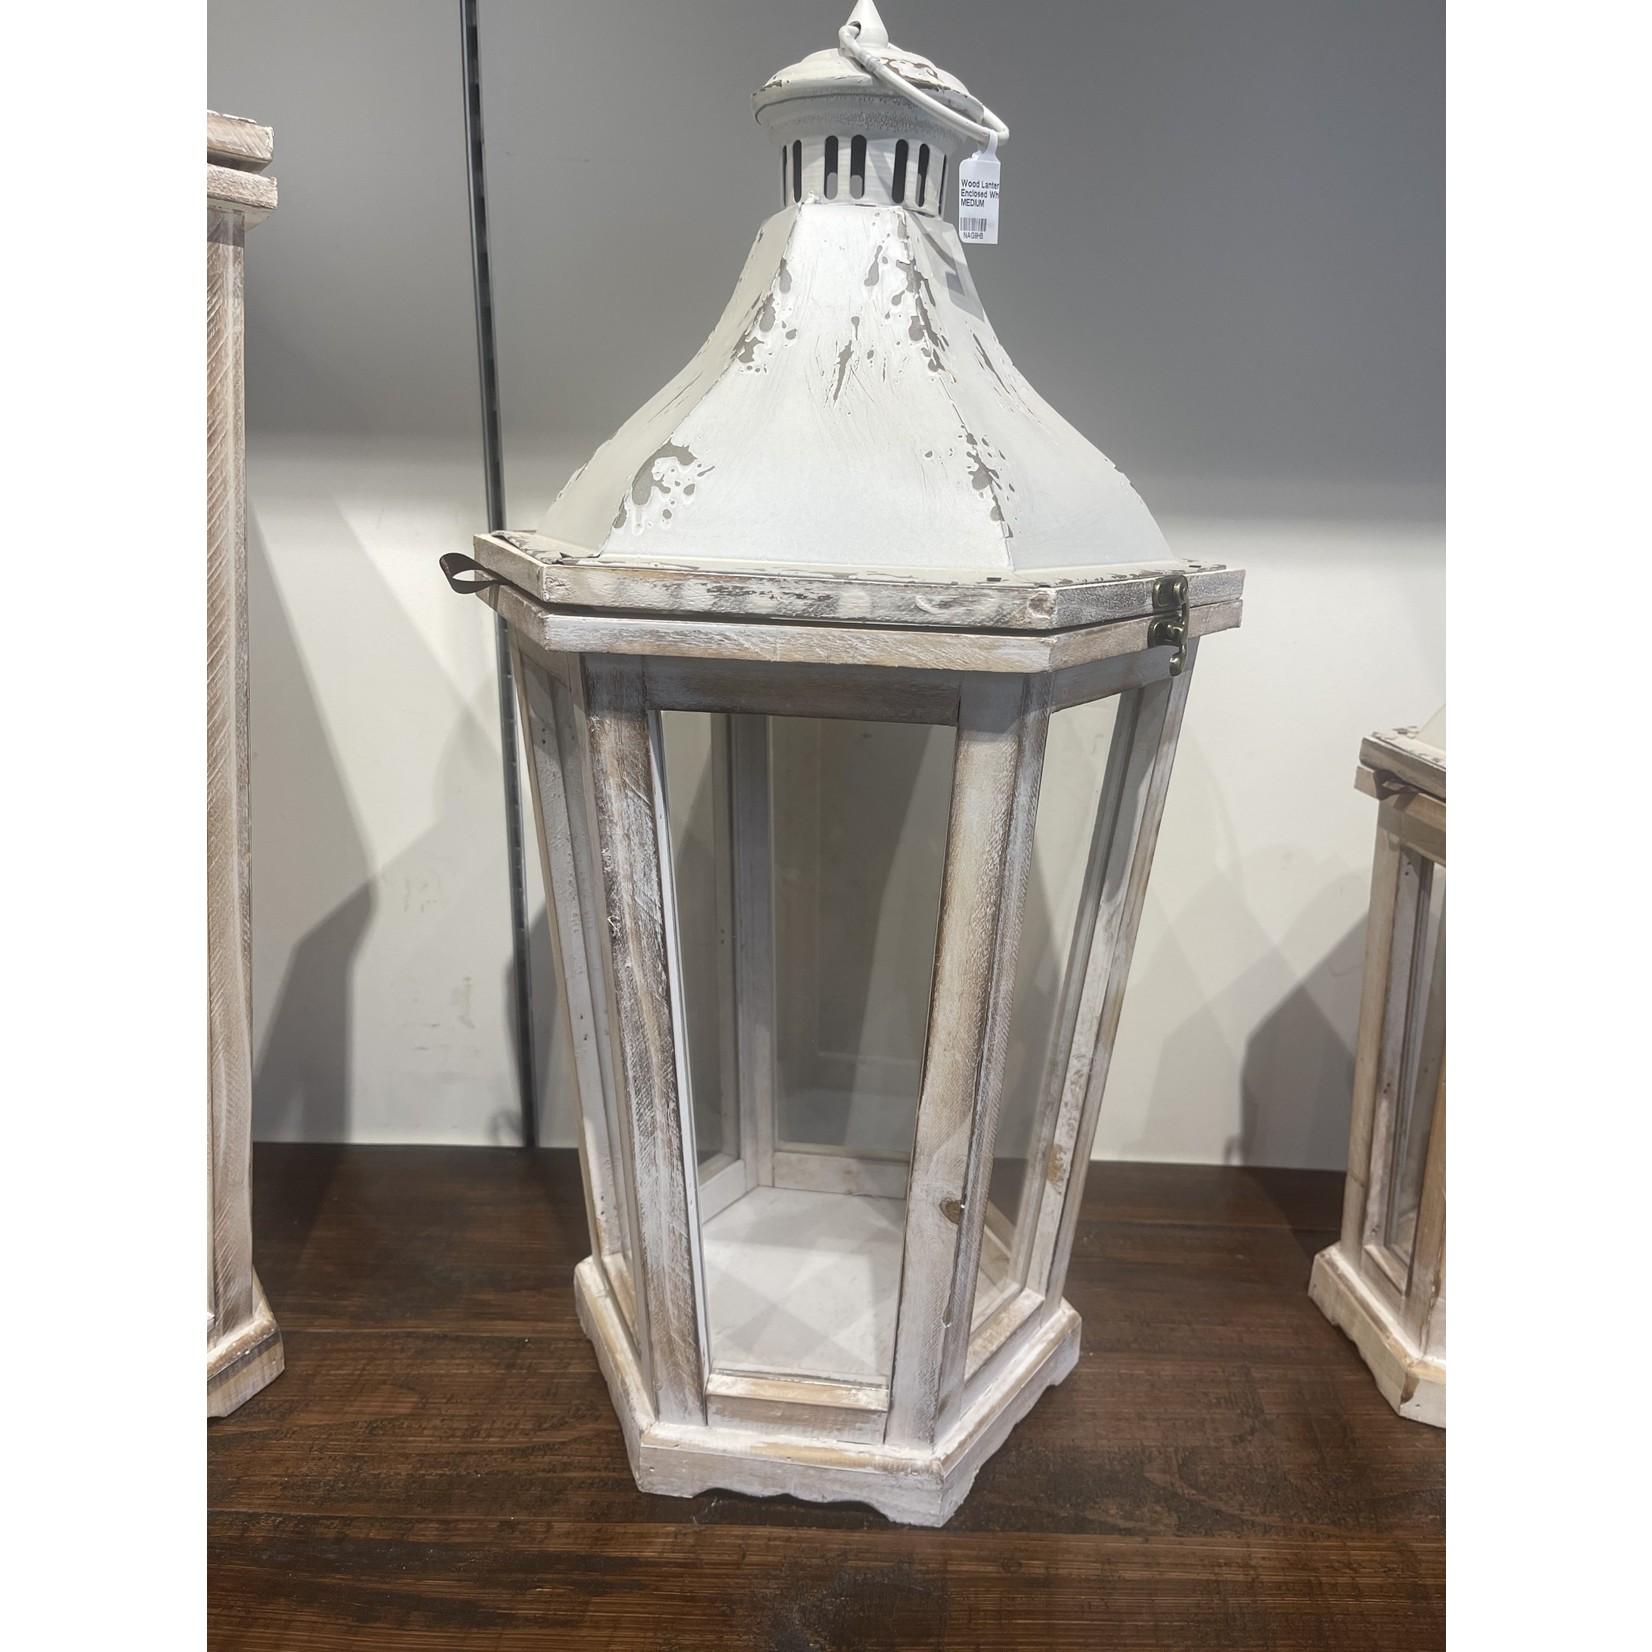 Wood Lantern Glass Enclosed White Top MEDIUM